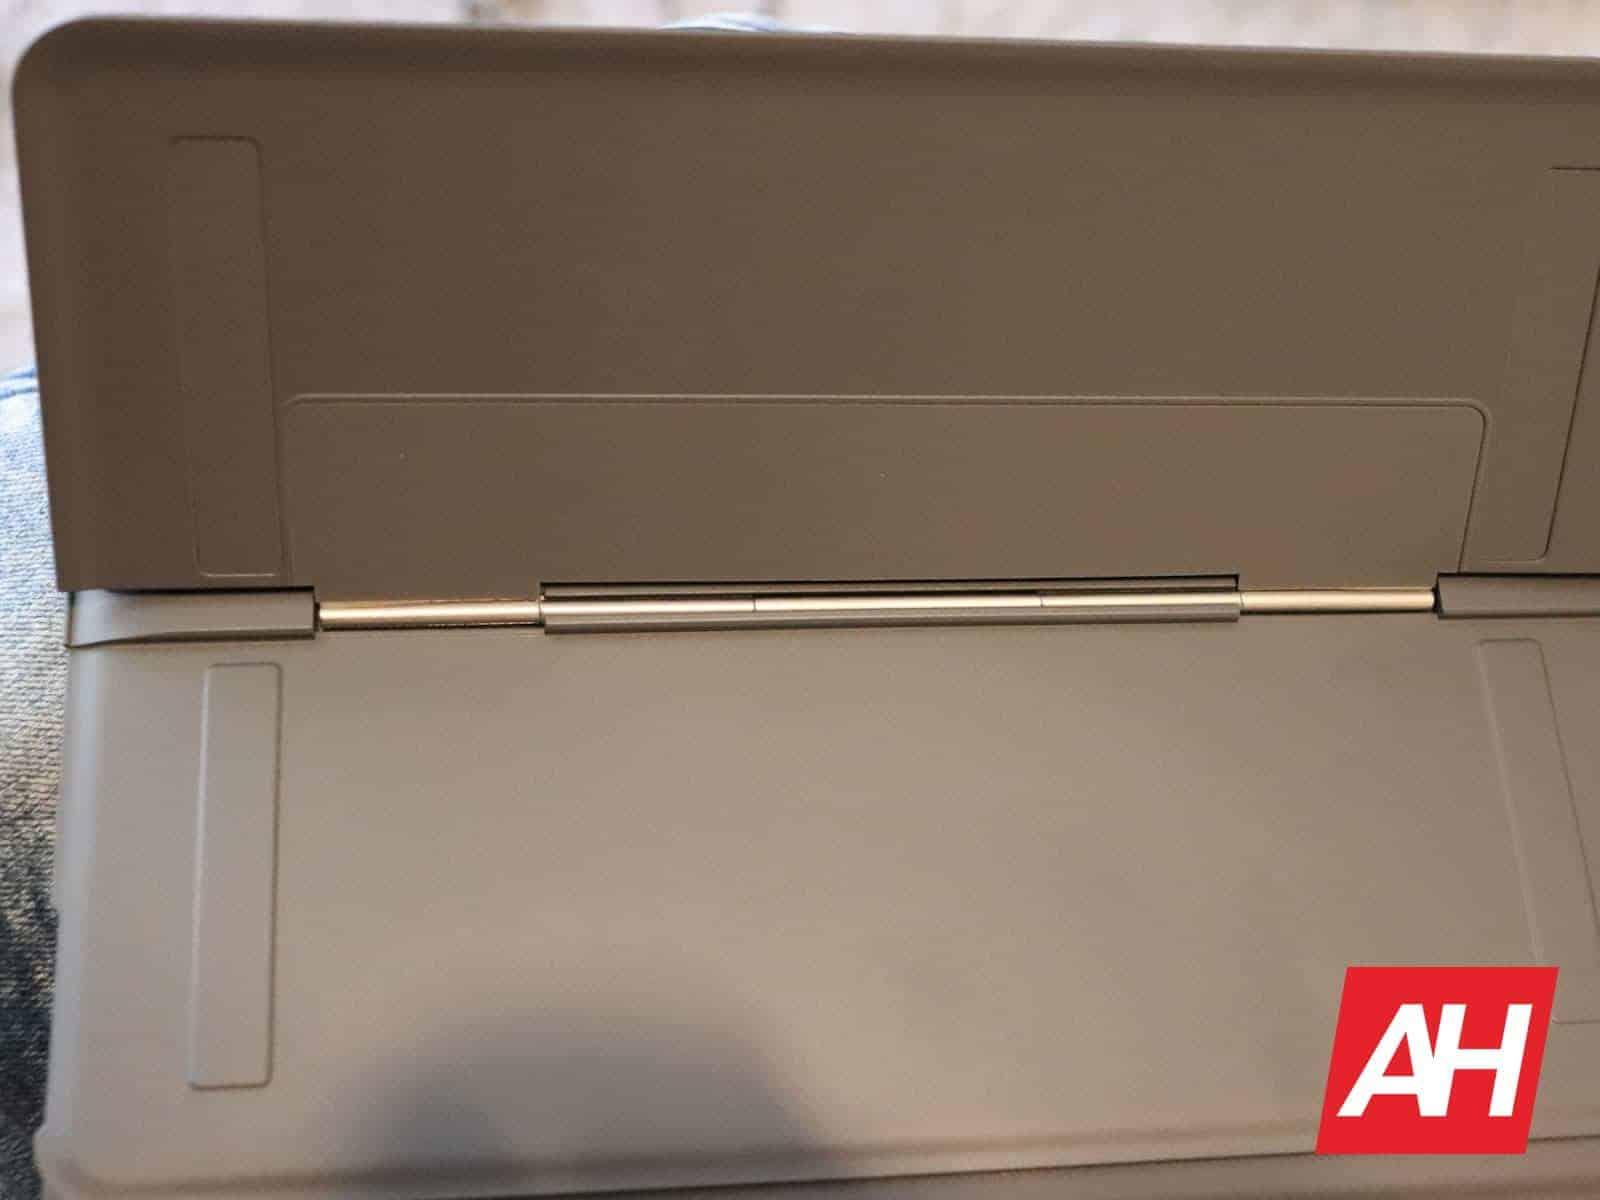 04 3 Lenovo IdeaPad Duet Hardware AH 2020